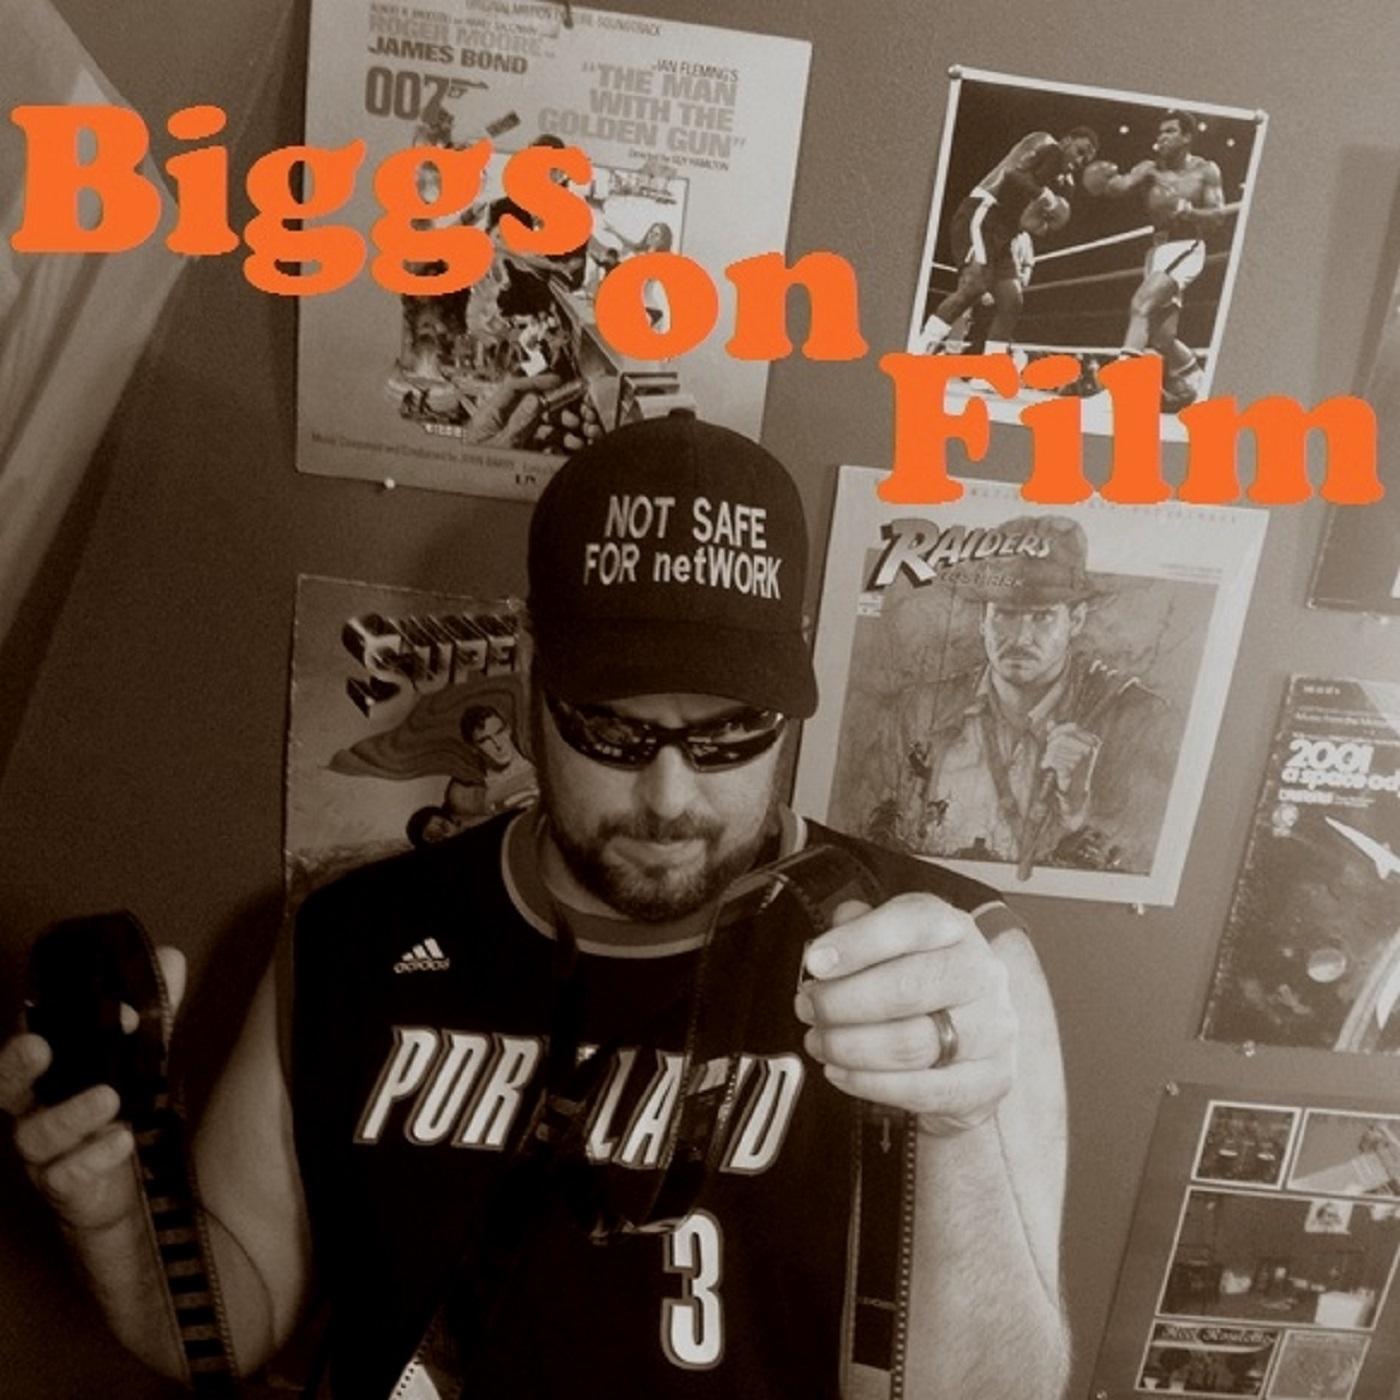 Biggs on Film